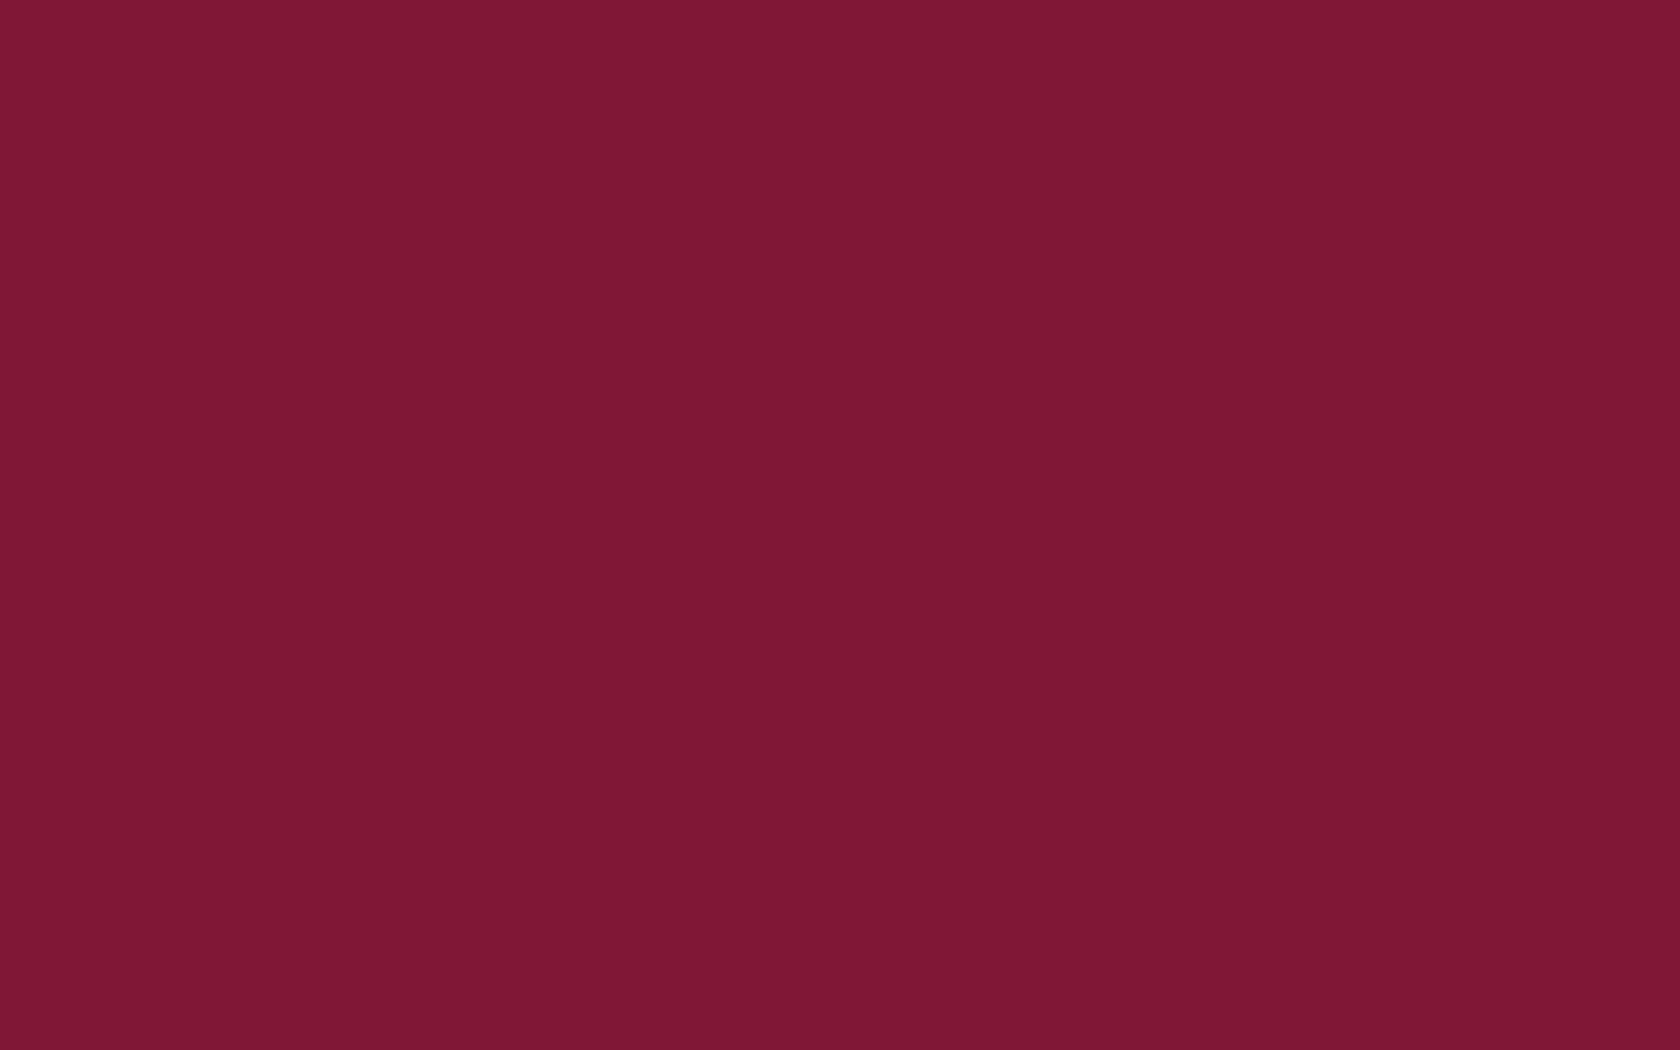 1680x1050 Claret Solid Color Background